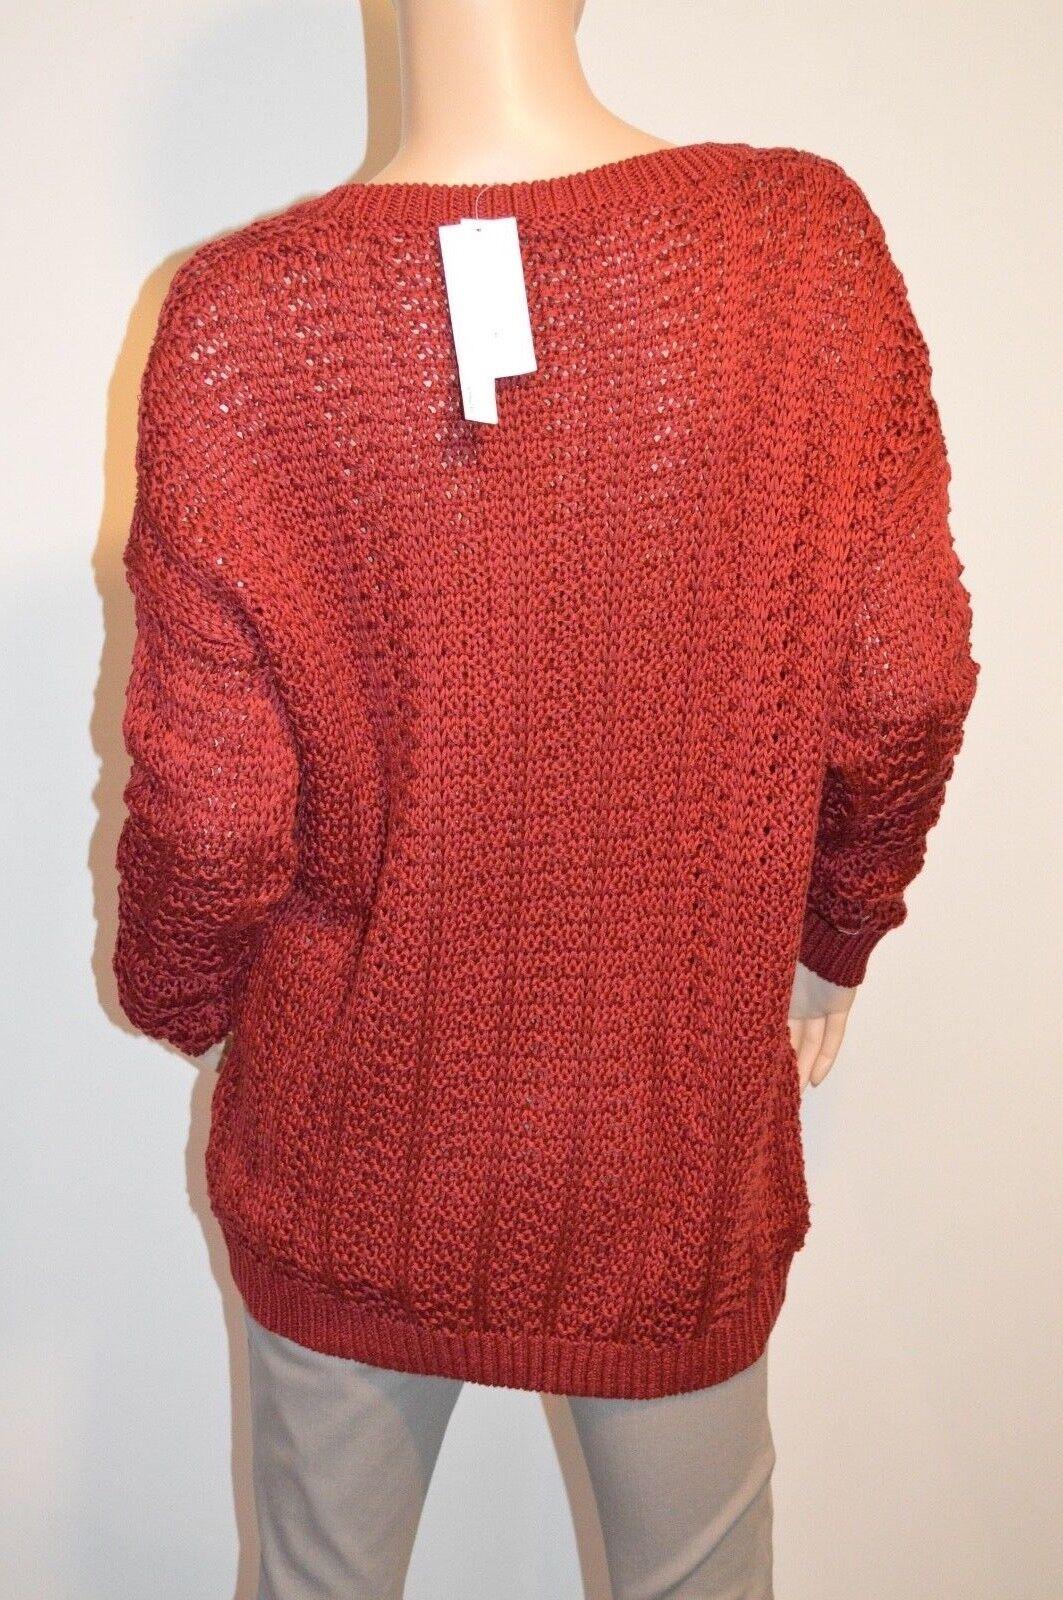 NEW  BRIONI Polo  Short Sleeve Cotton Size Eu XL Us Eu Size 54 (Tubic) 90f396